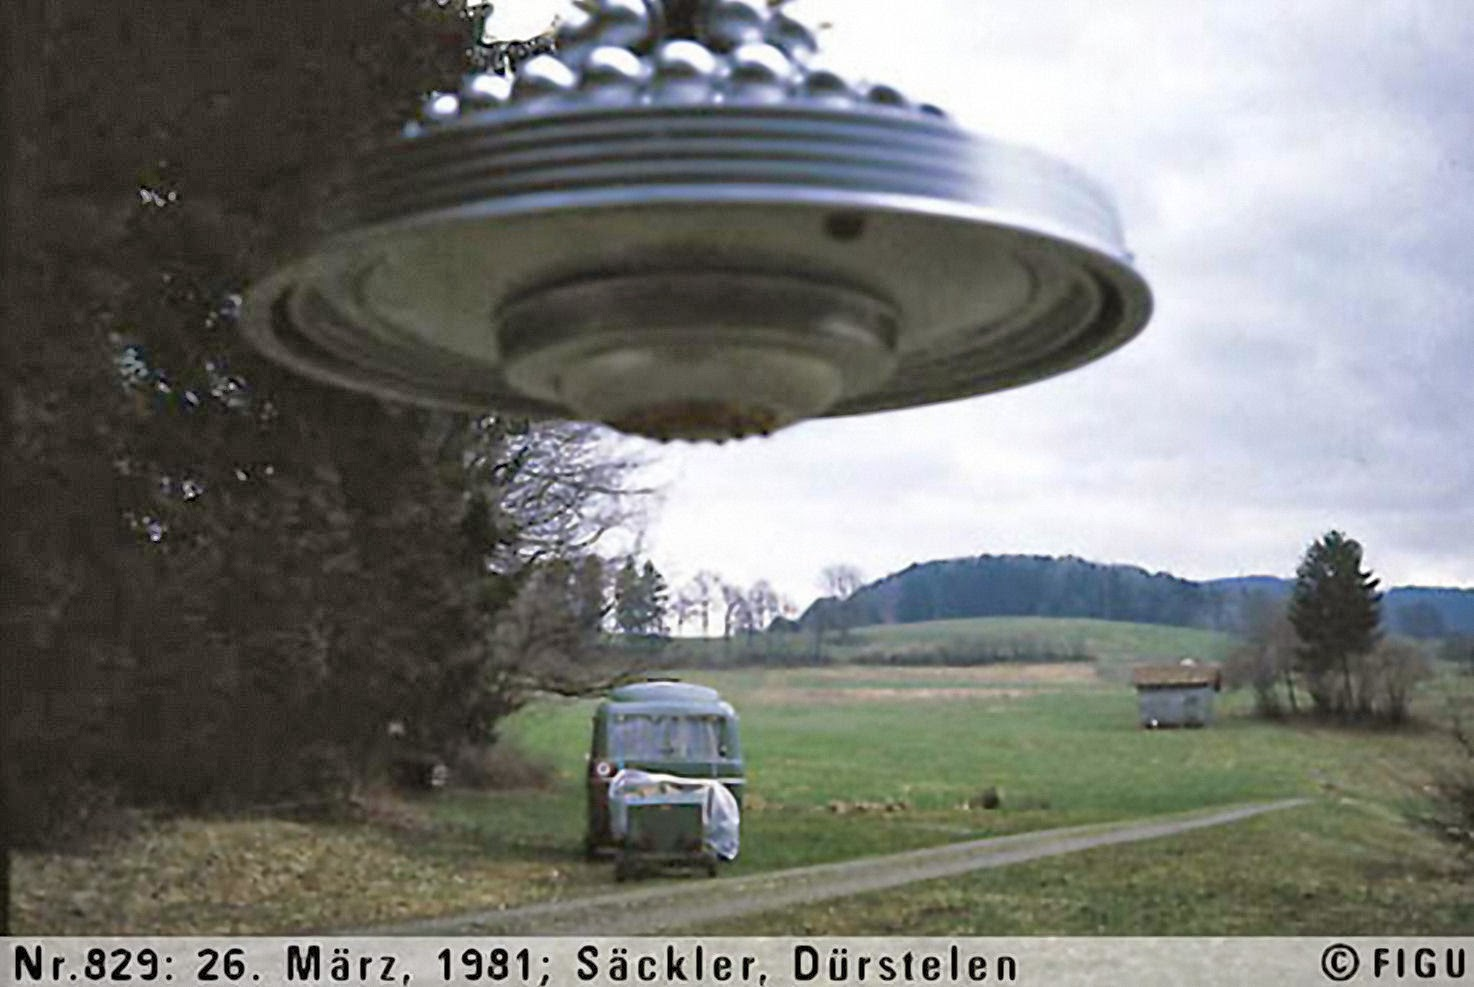 [SURNATUREL] OVNIRAMA, Le topic officiel des extraterrestres - Page 33 015